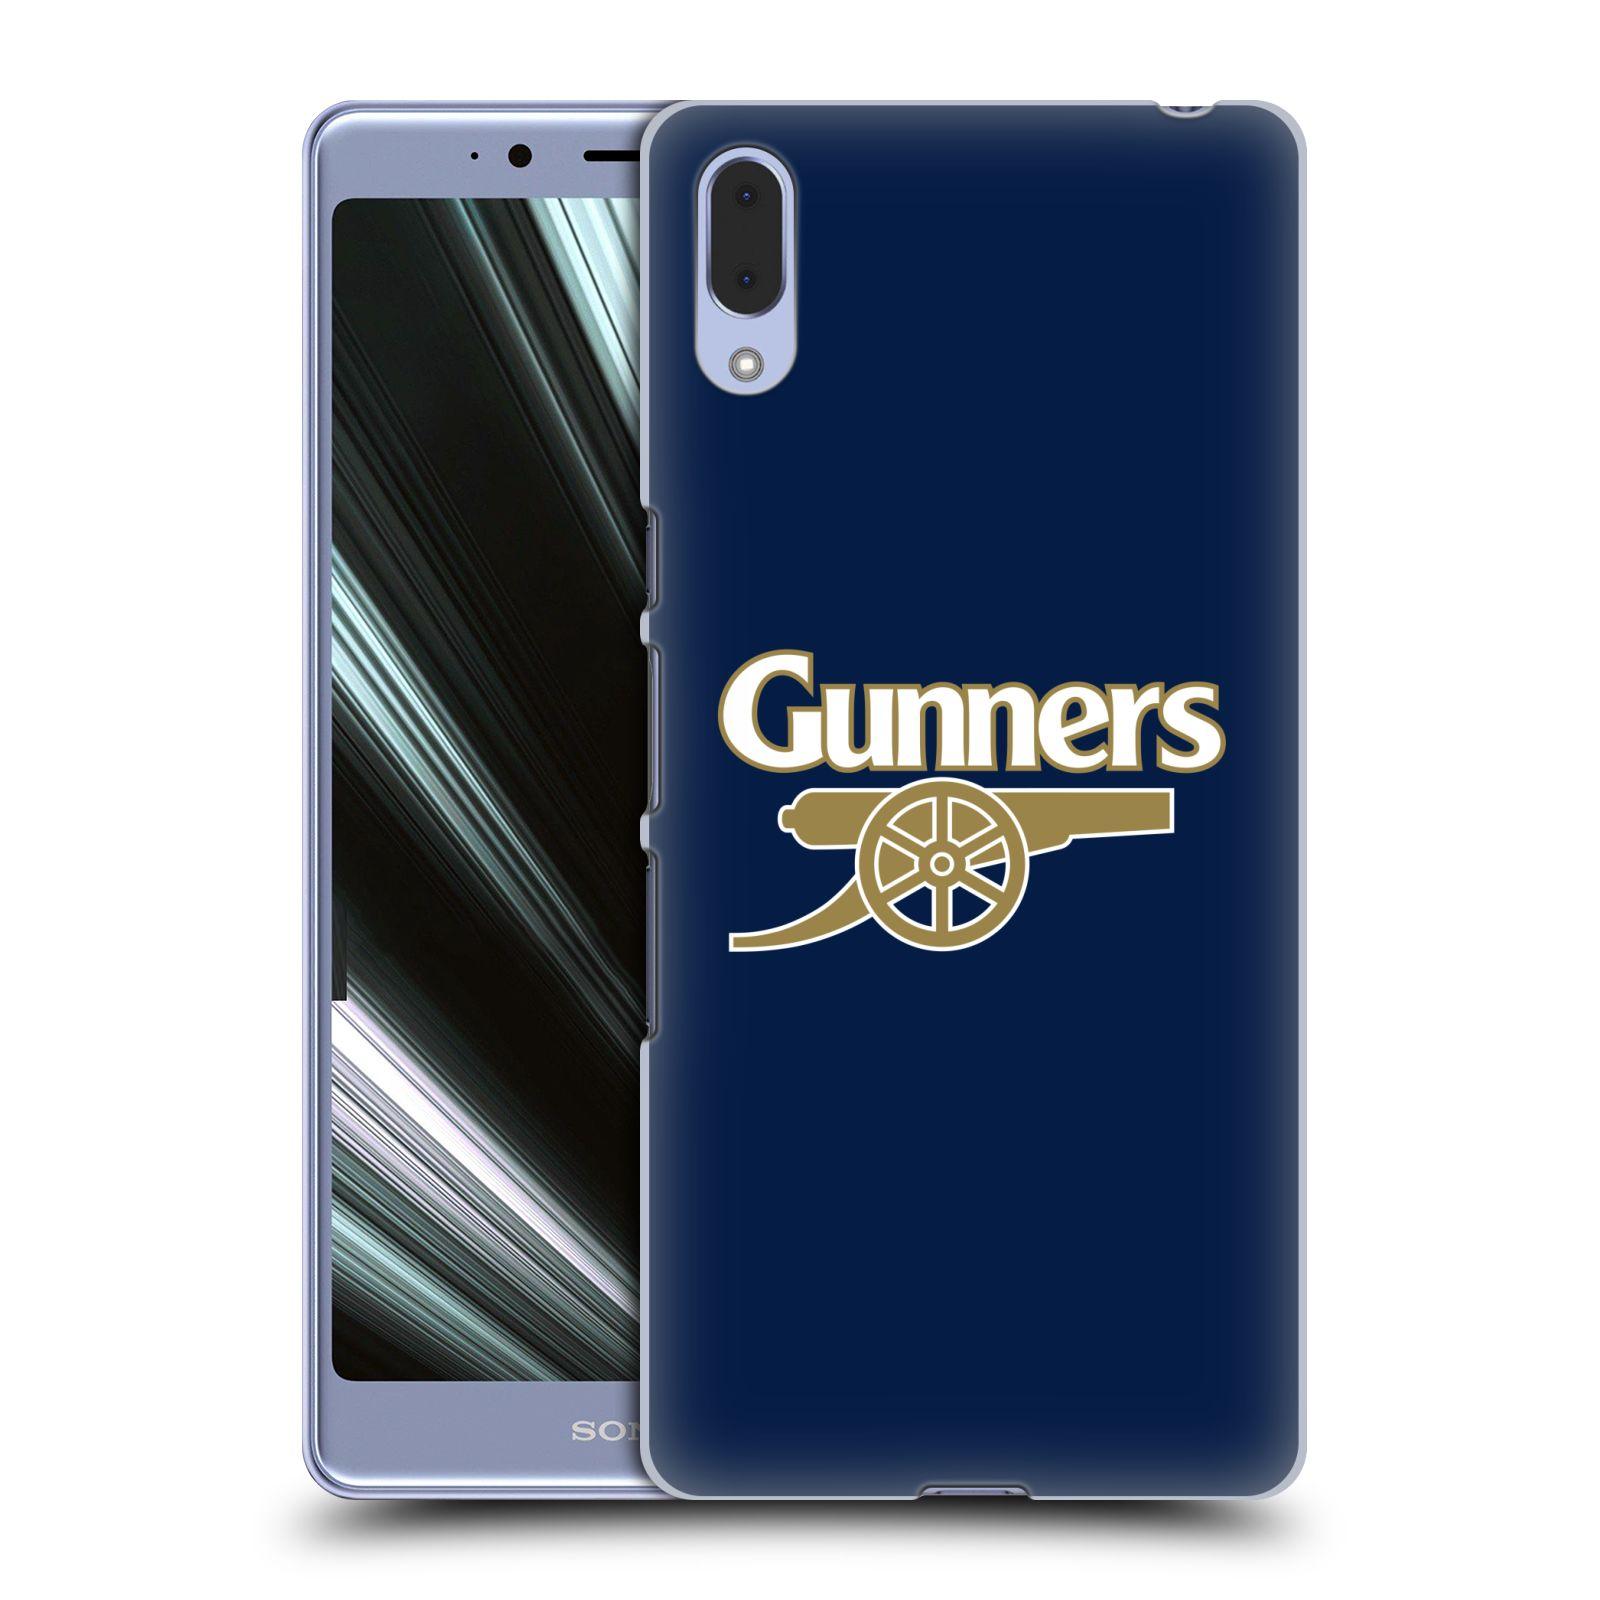 Plastové pouzdro na mobil Sony Xperia L3 - Head Case - Arsenal FC - Gunners